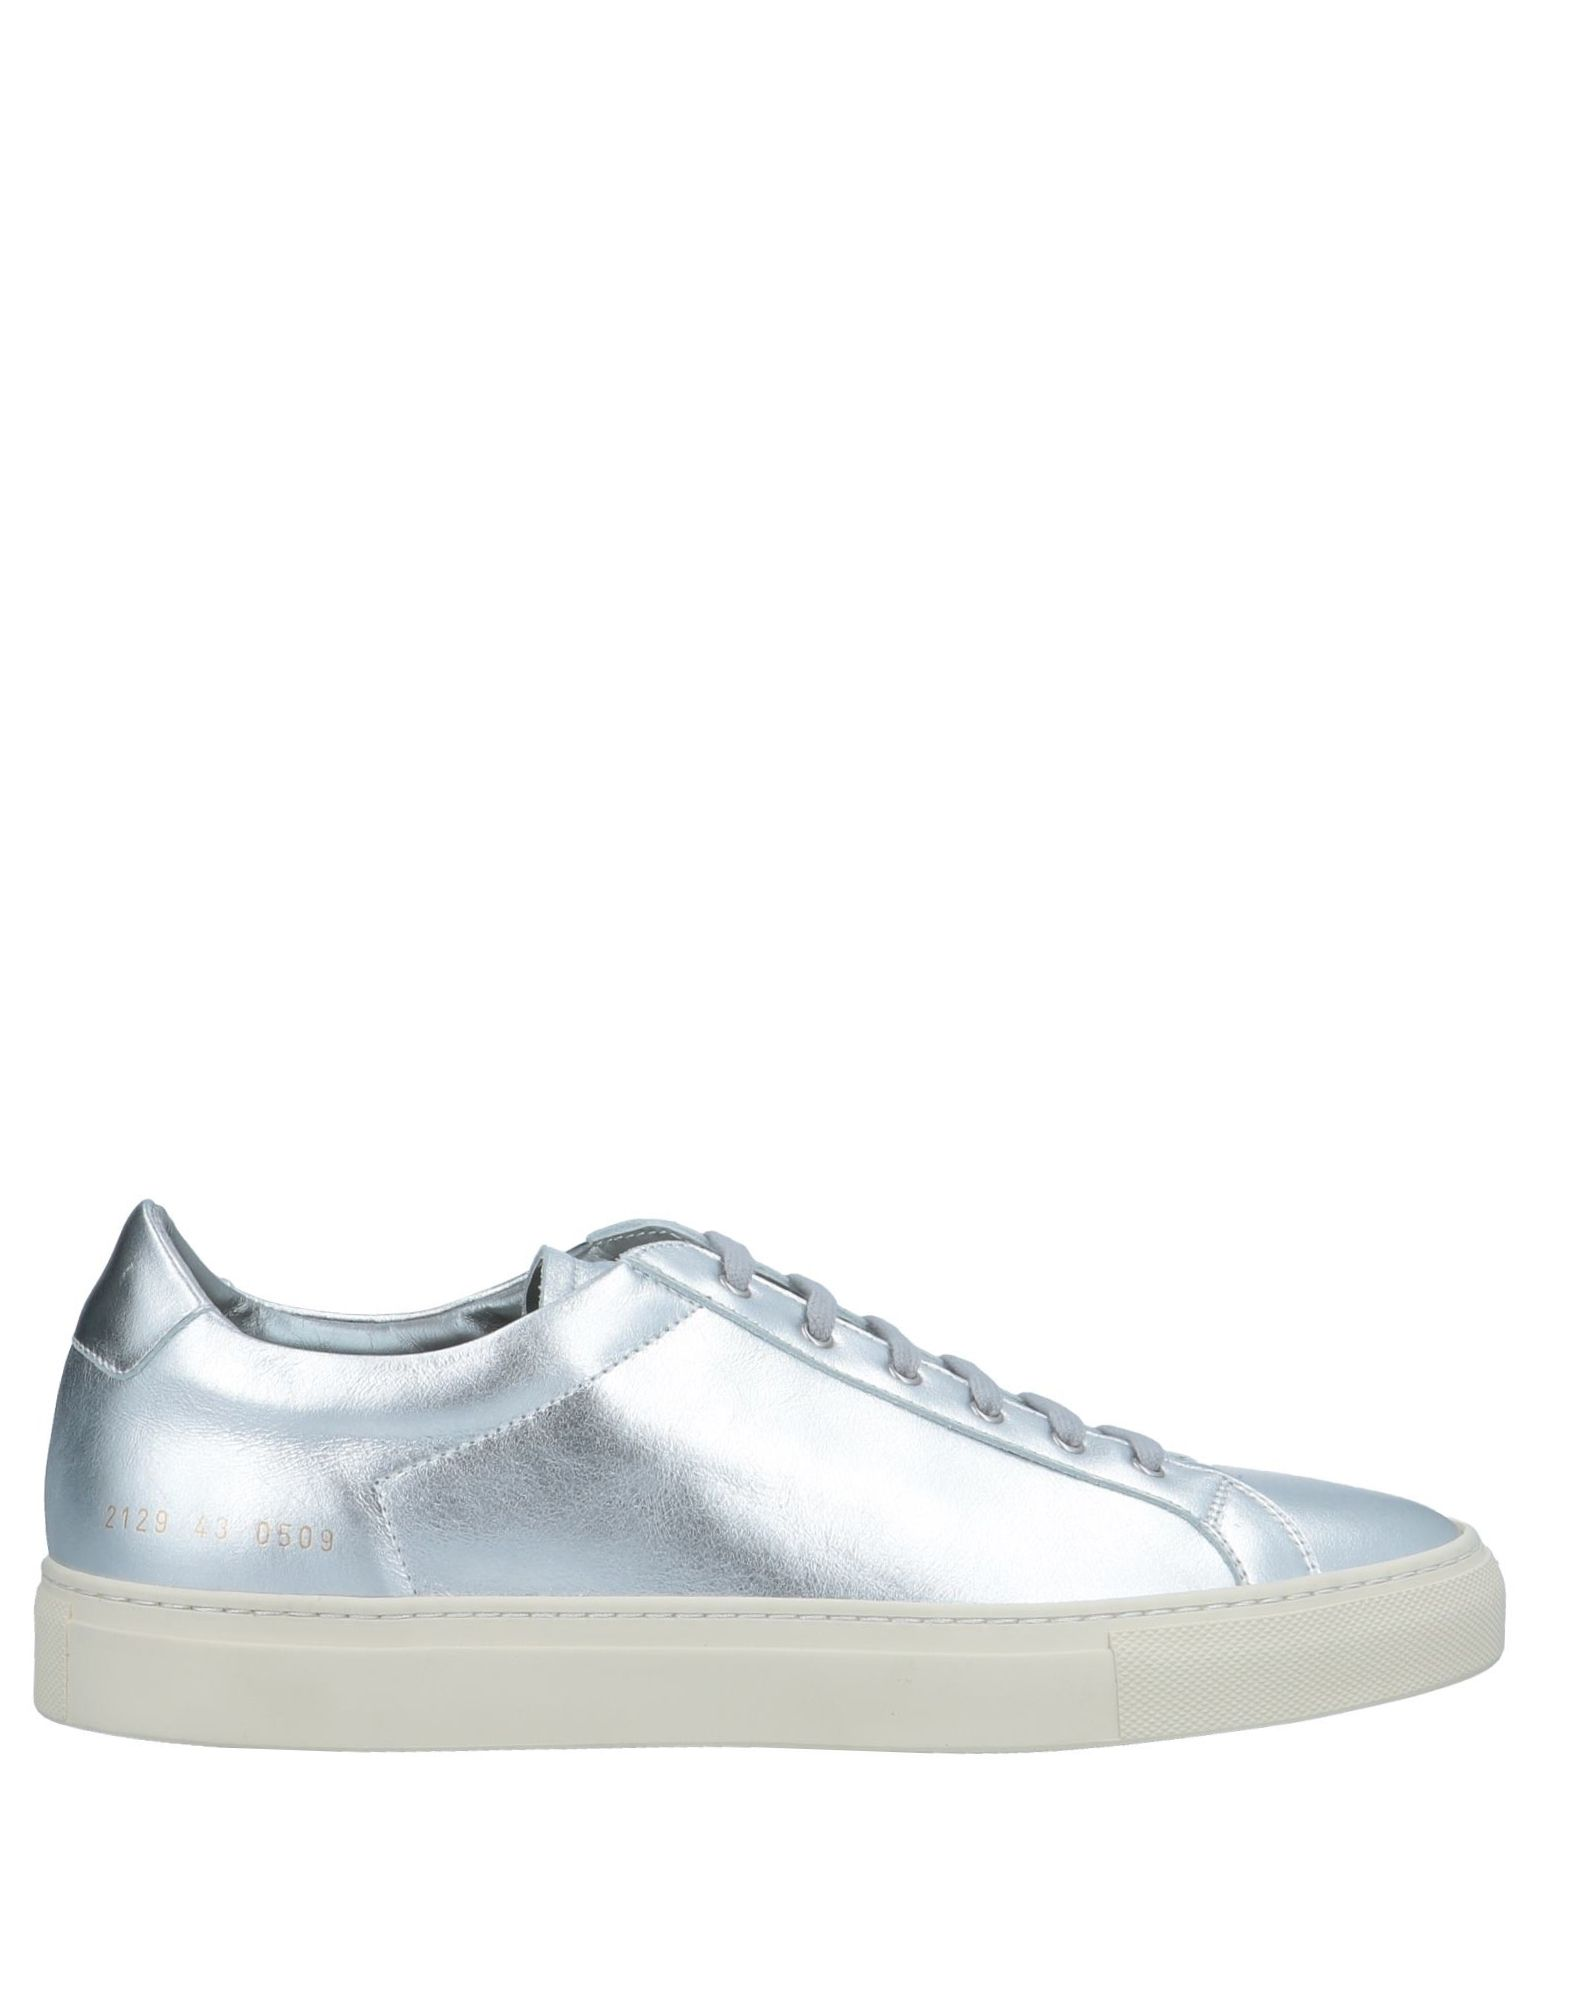 COMMON PROJECTS Низкие кеды и кроссовки демисезонные ботинки common projects obscure achilles mesh low grey page 2